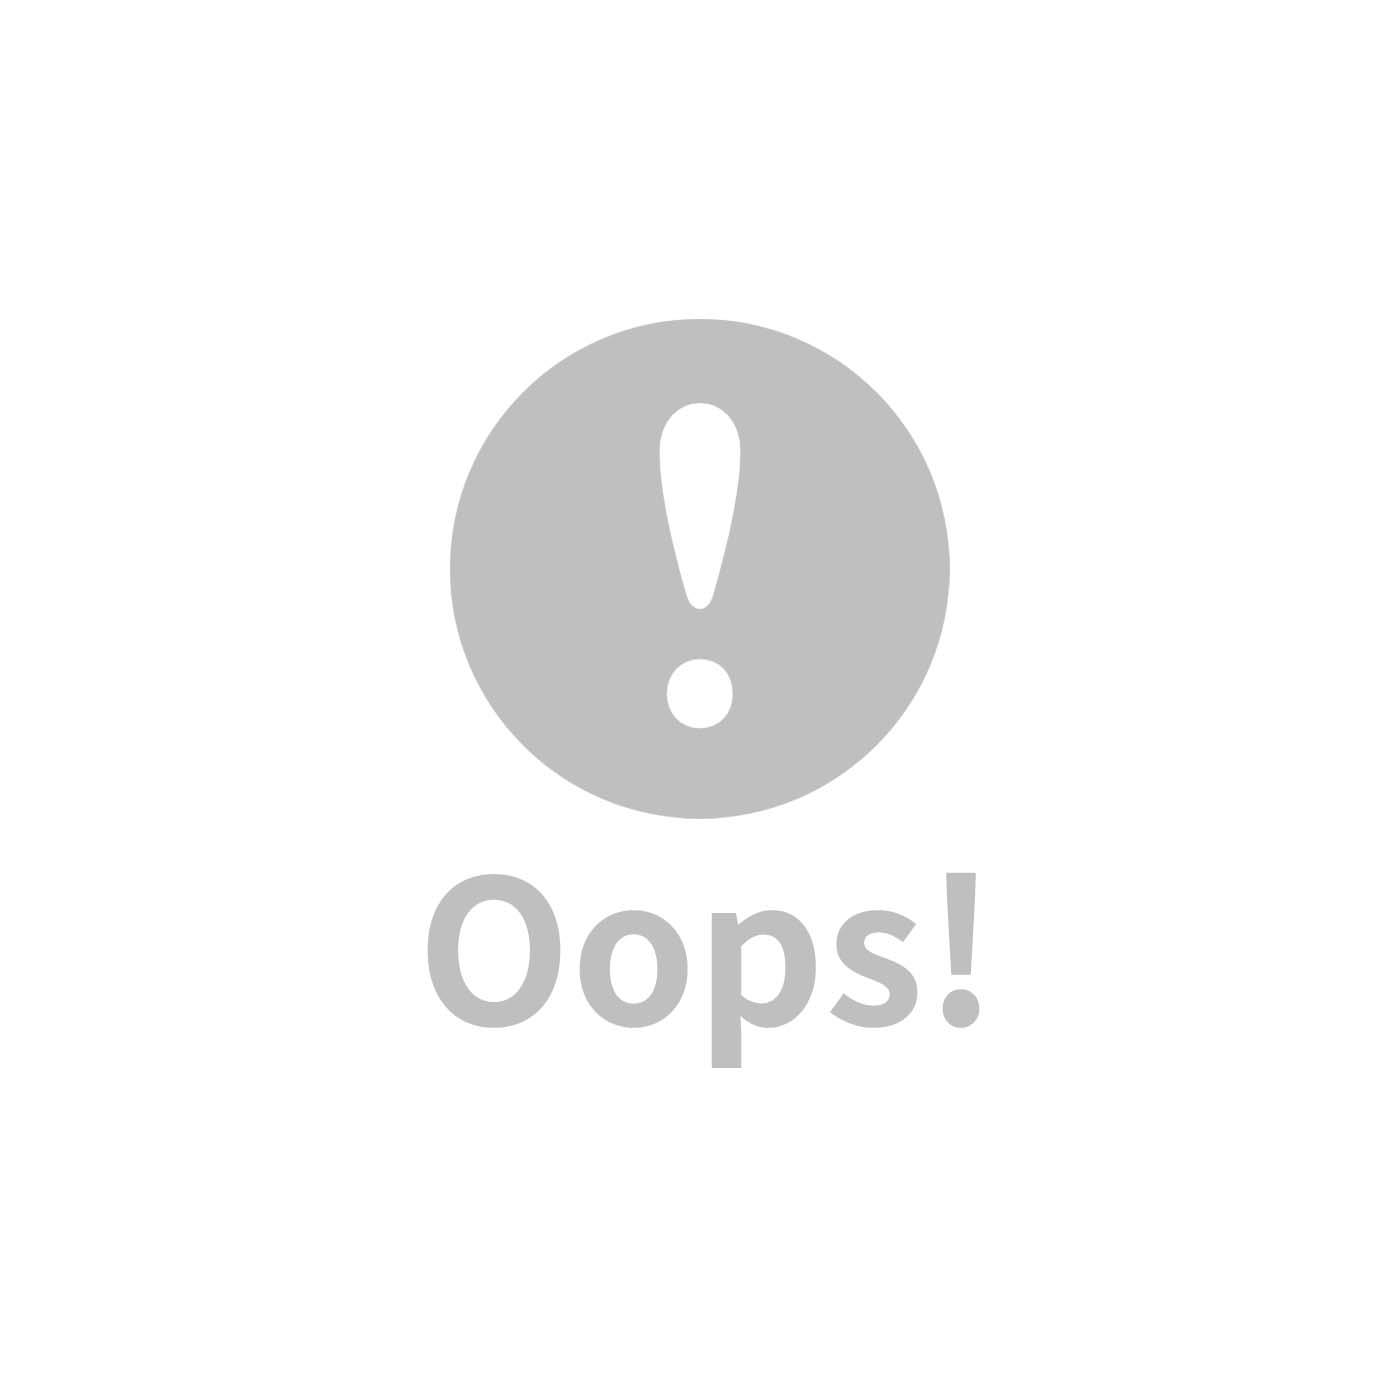 air cossi 超透氣抗菌天絲坐墊_嬰兒推車枕頭 (新生兒全身包覆款0-4m)(清新綠)